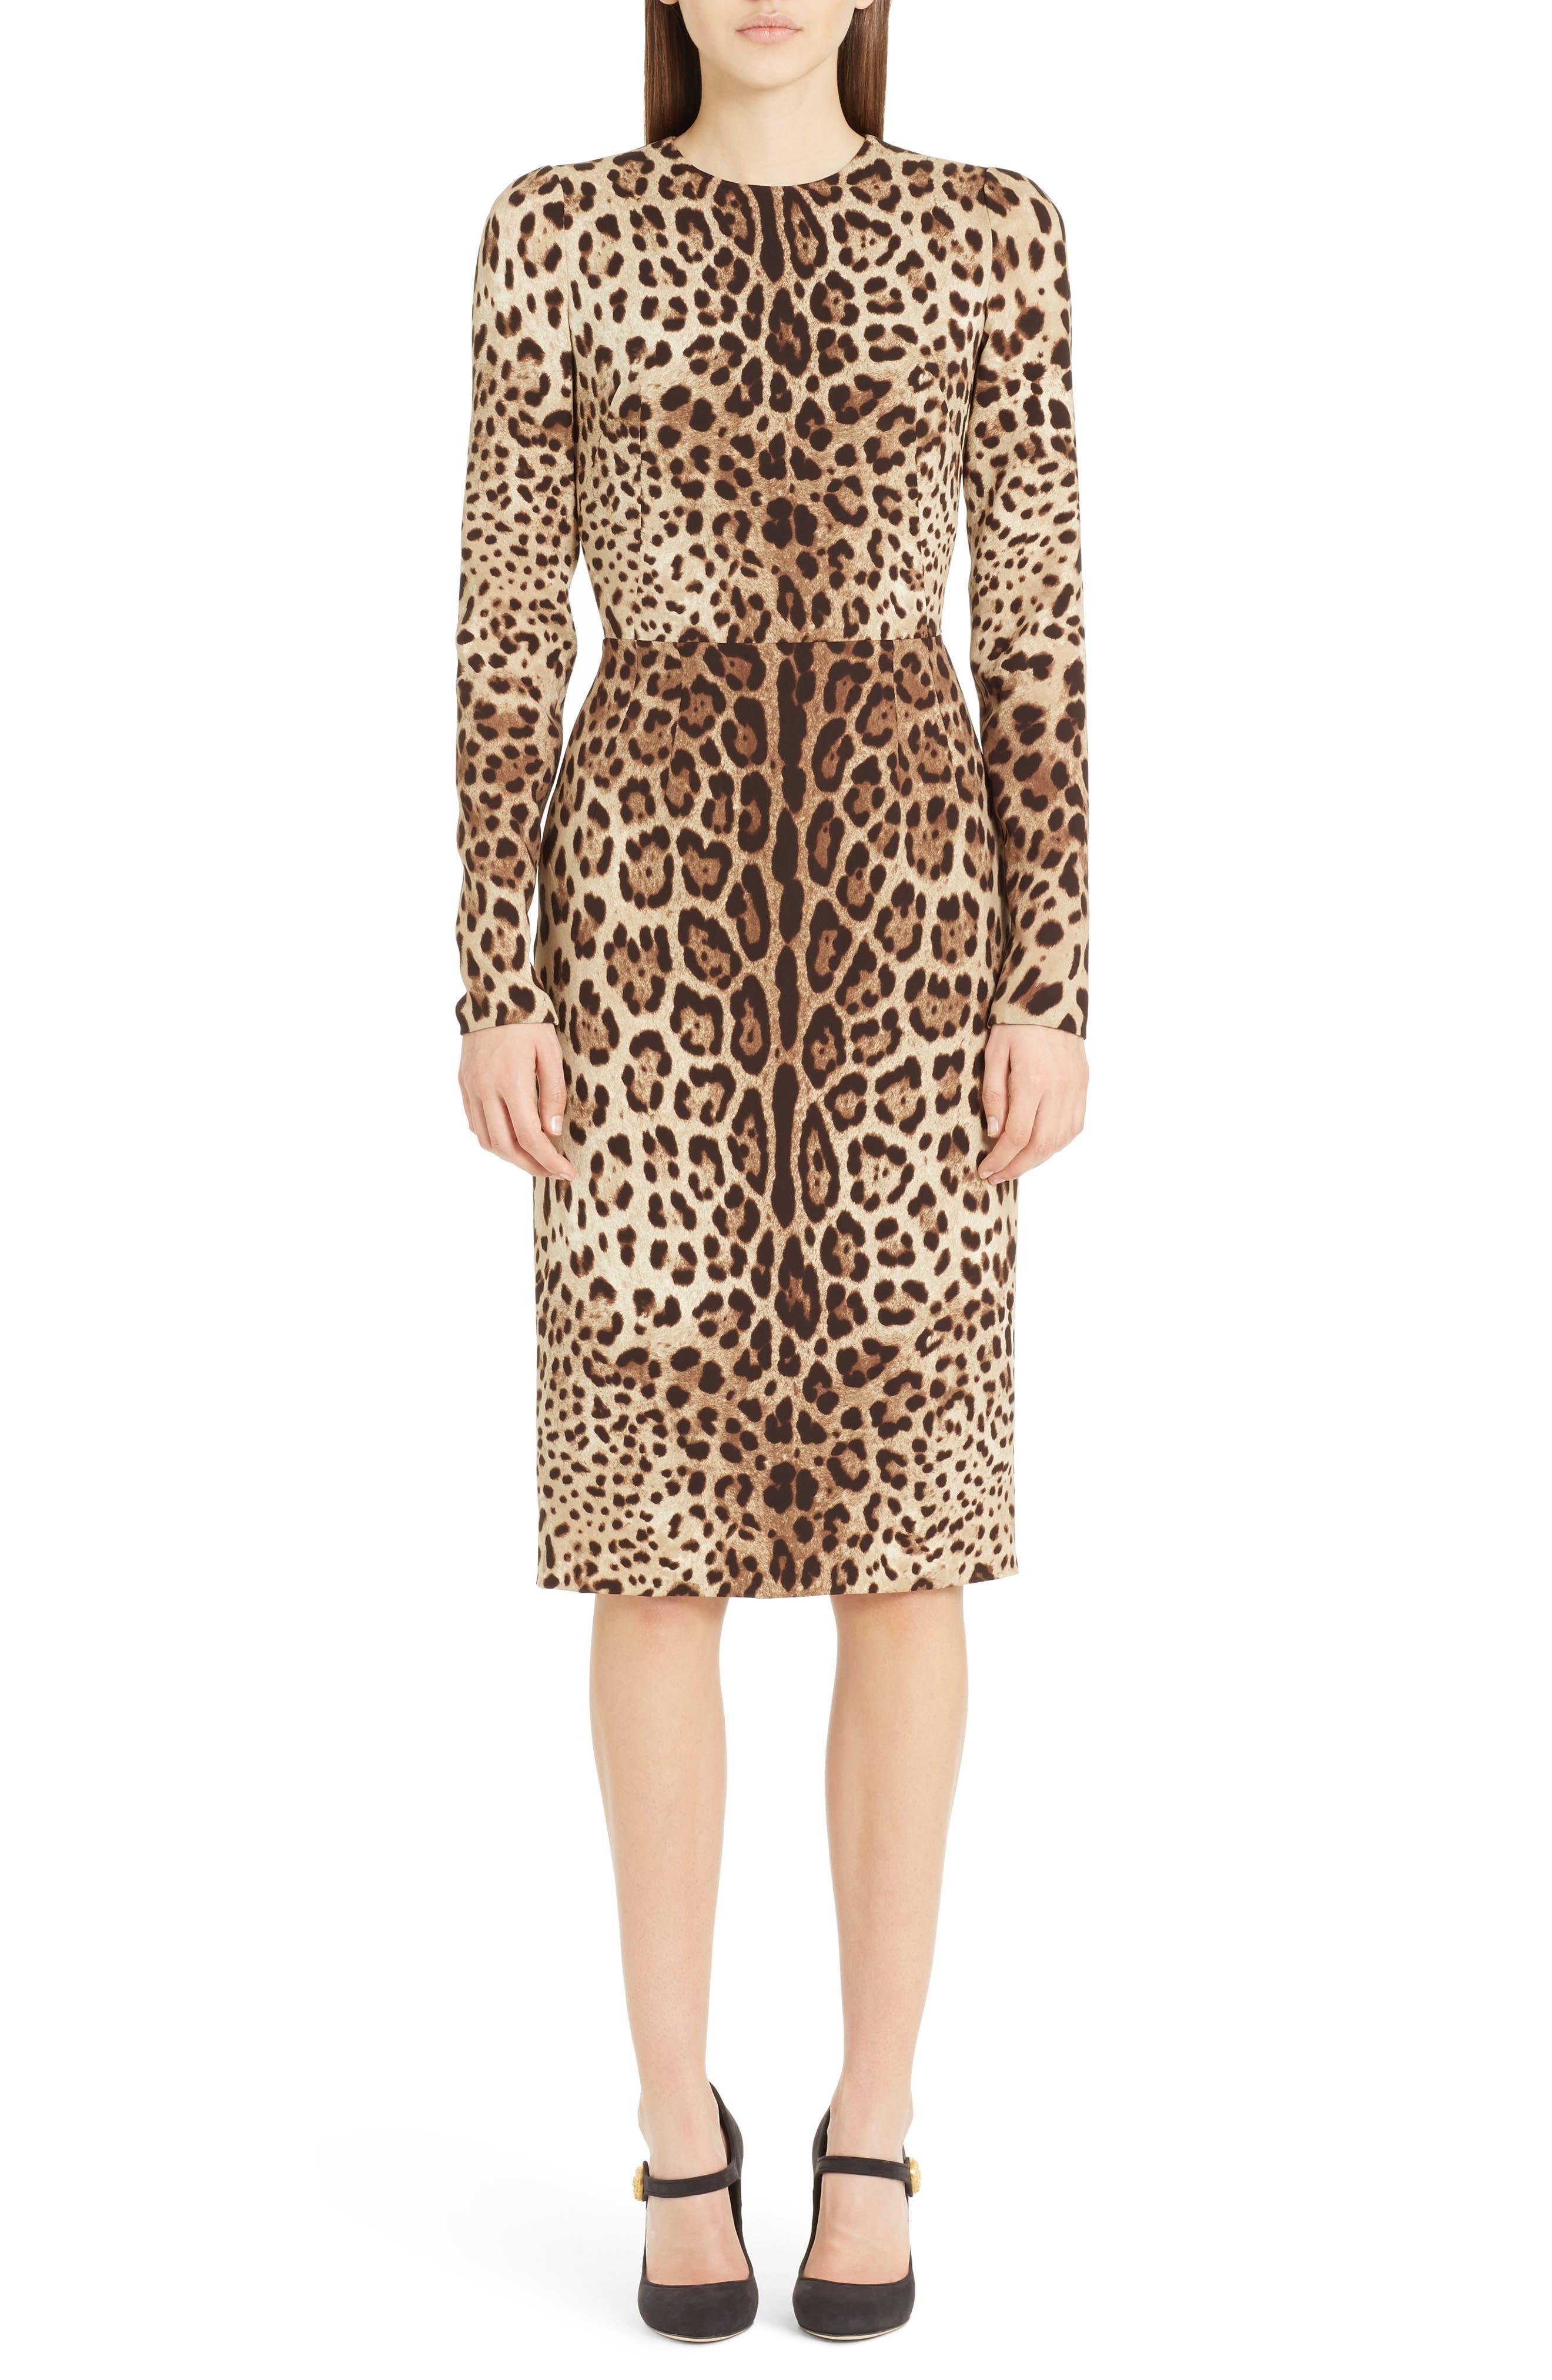 Dolce&Gabbana Leopard Print Stretch Silk Sheath Dress